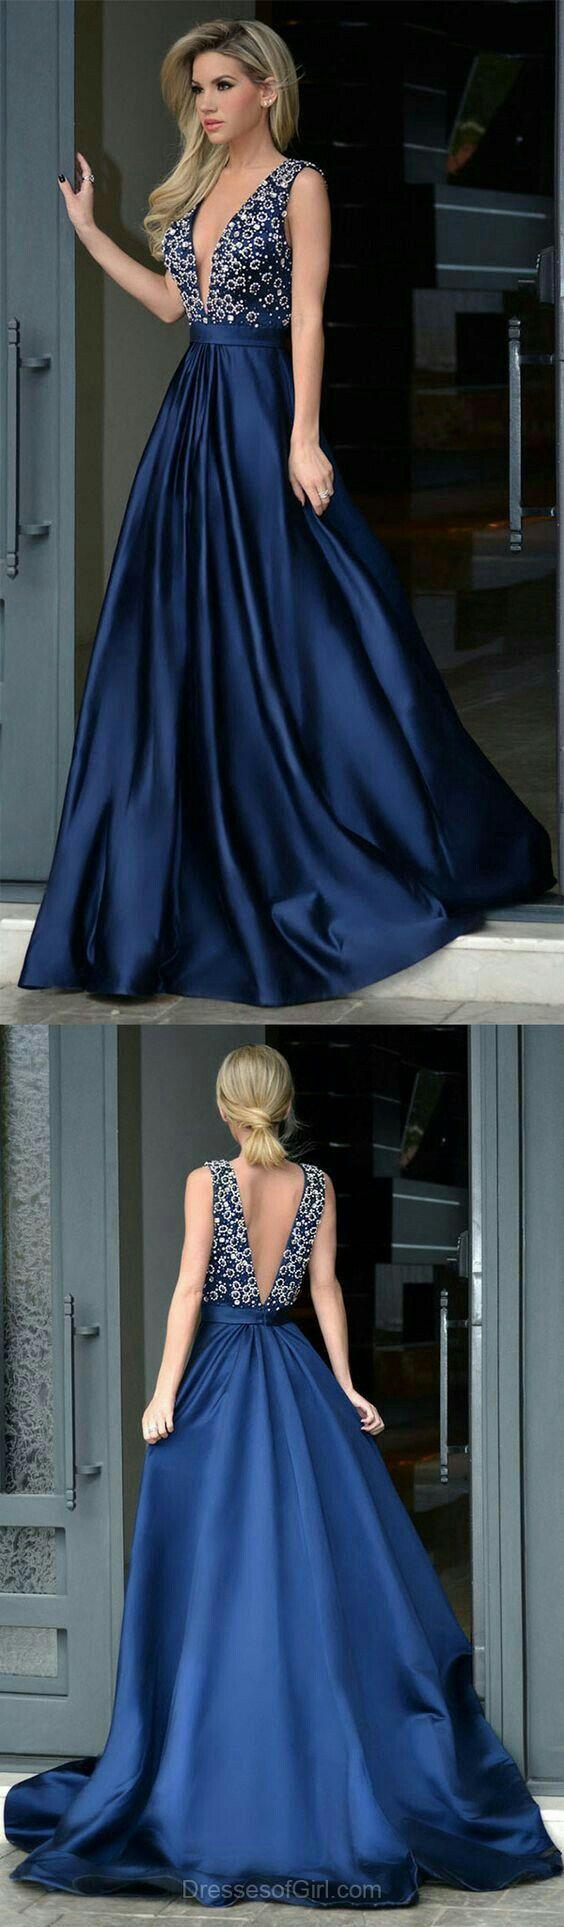 So pretty moda pinterest prom navy prom dresses and dress formal